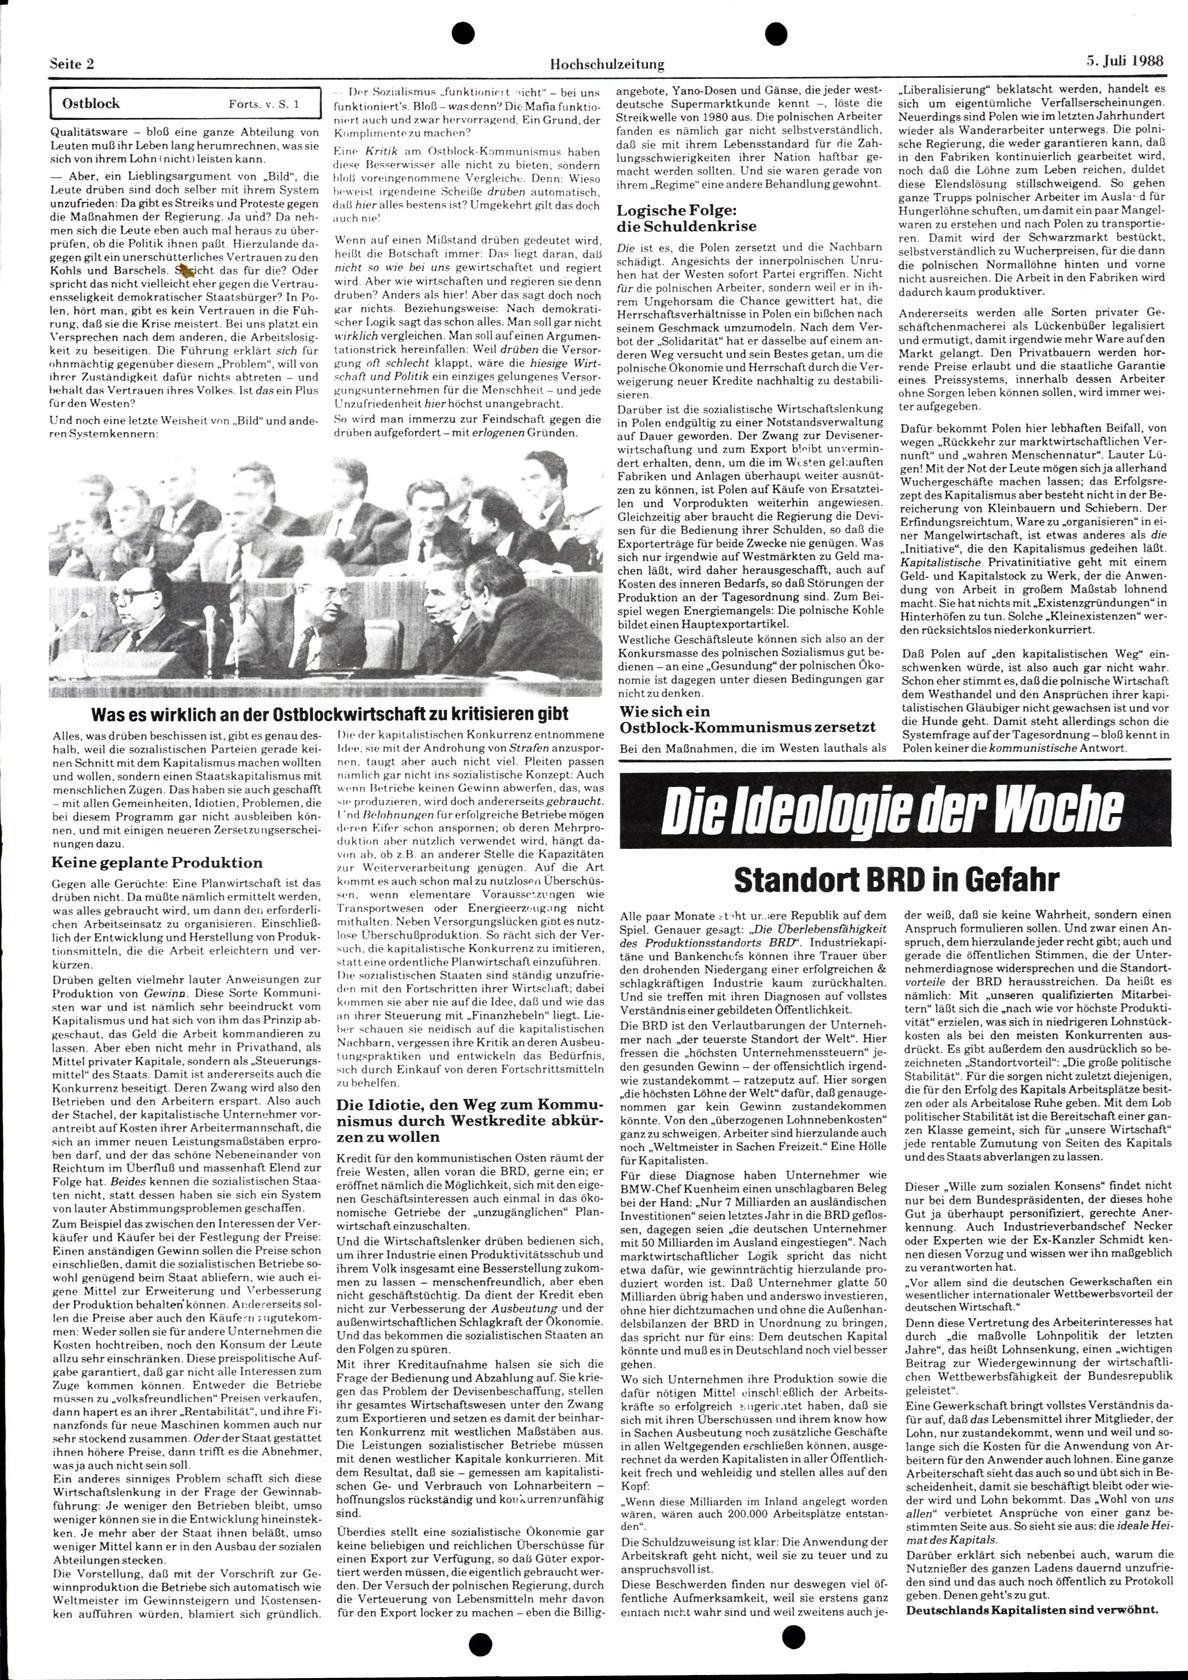 Bochum_BHZ_19880705_175_002